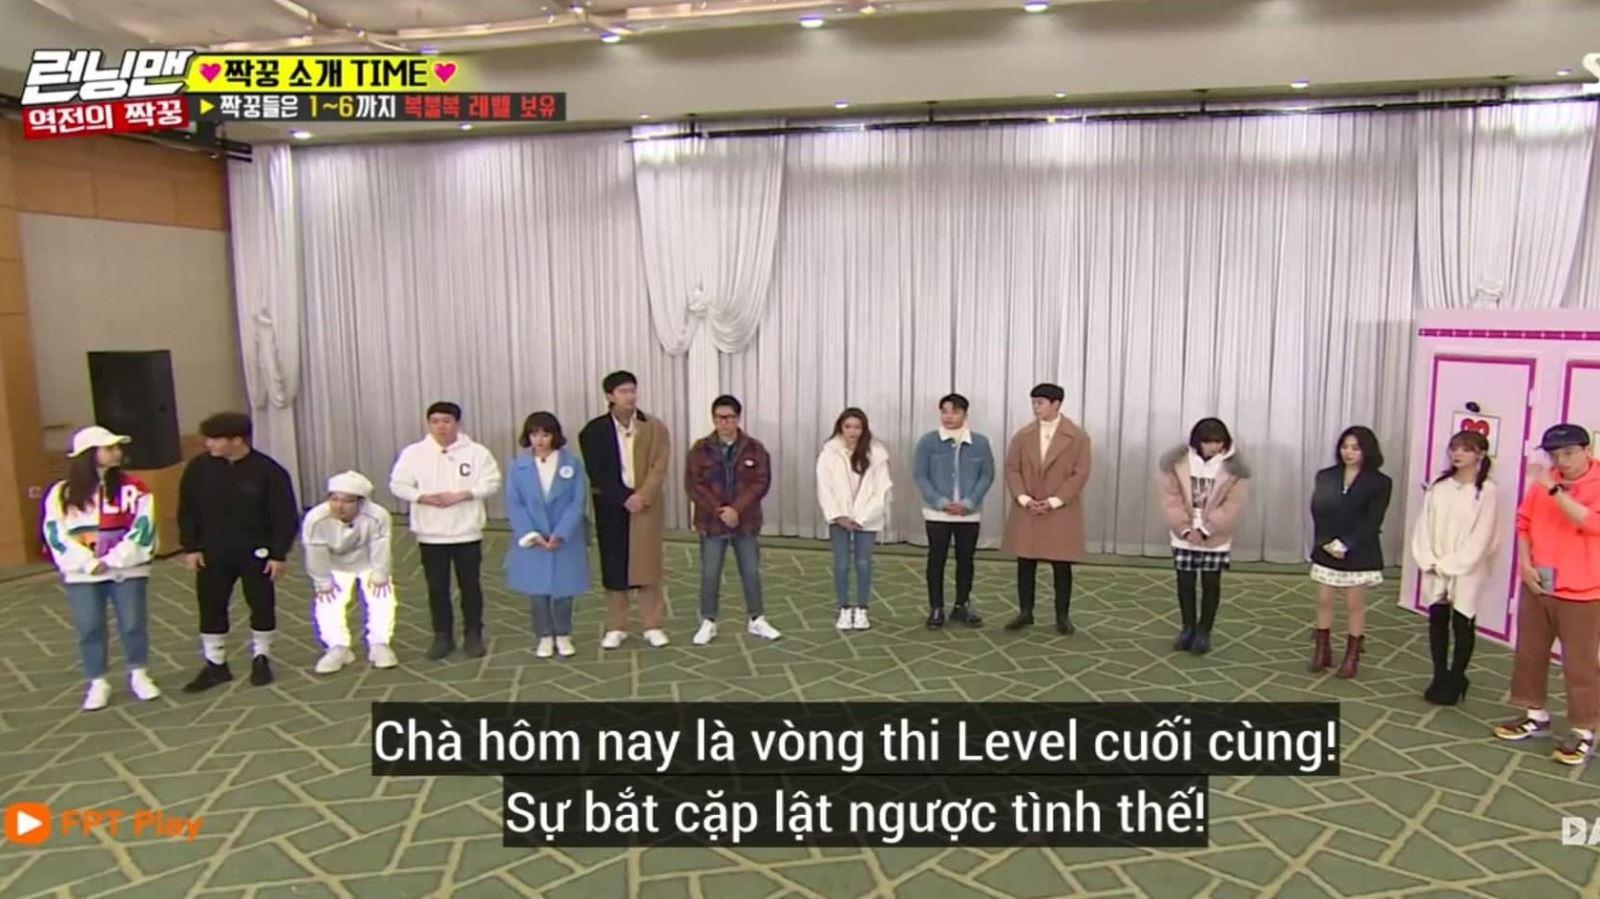 xem running man tập 436 kim jong kook song ji hyo running man mua 2019 ttvh online kim jong kook song ji hyo running man